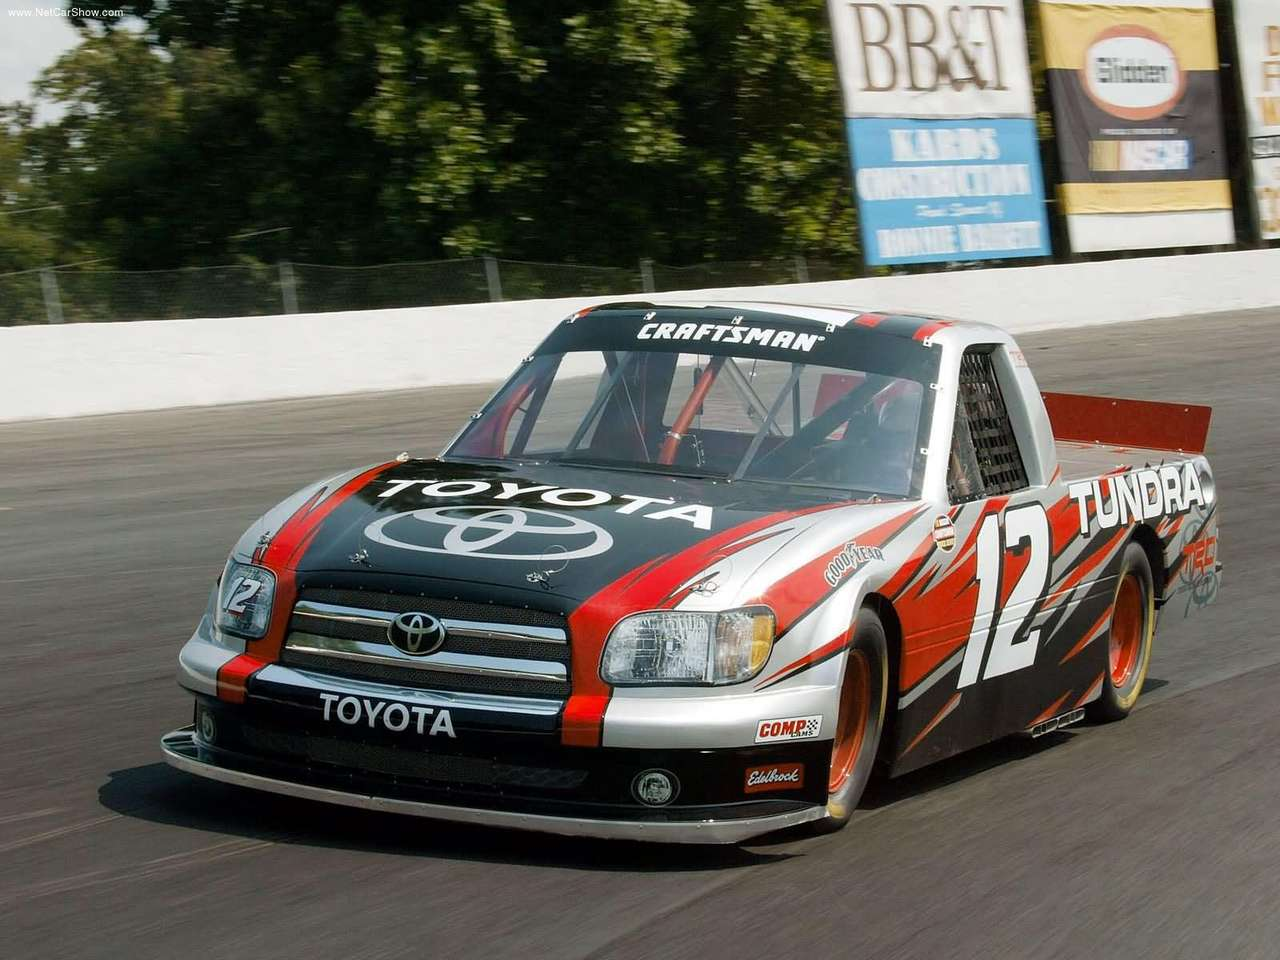 2004 Toyota Tundra NASCAR Craftsman Series Truck